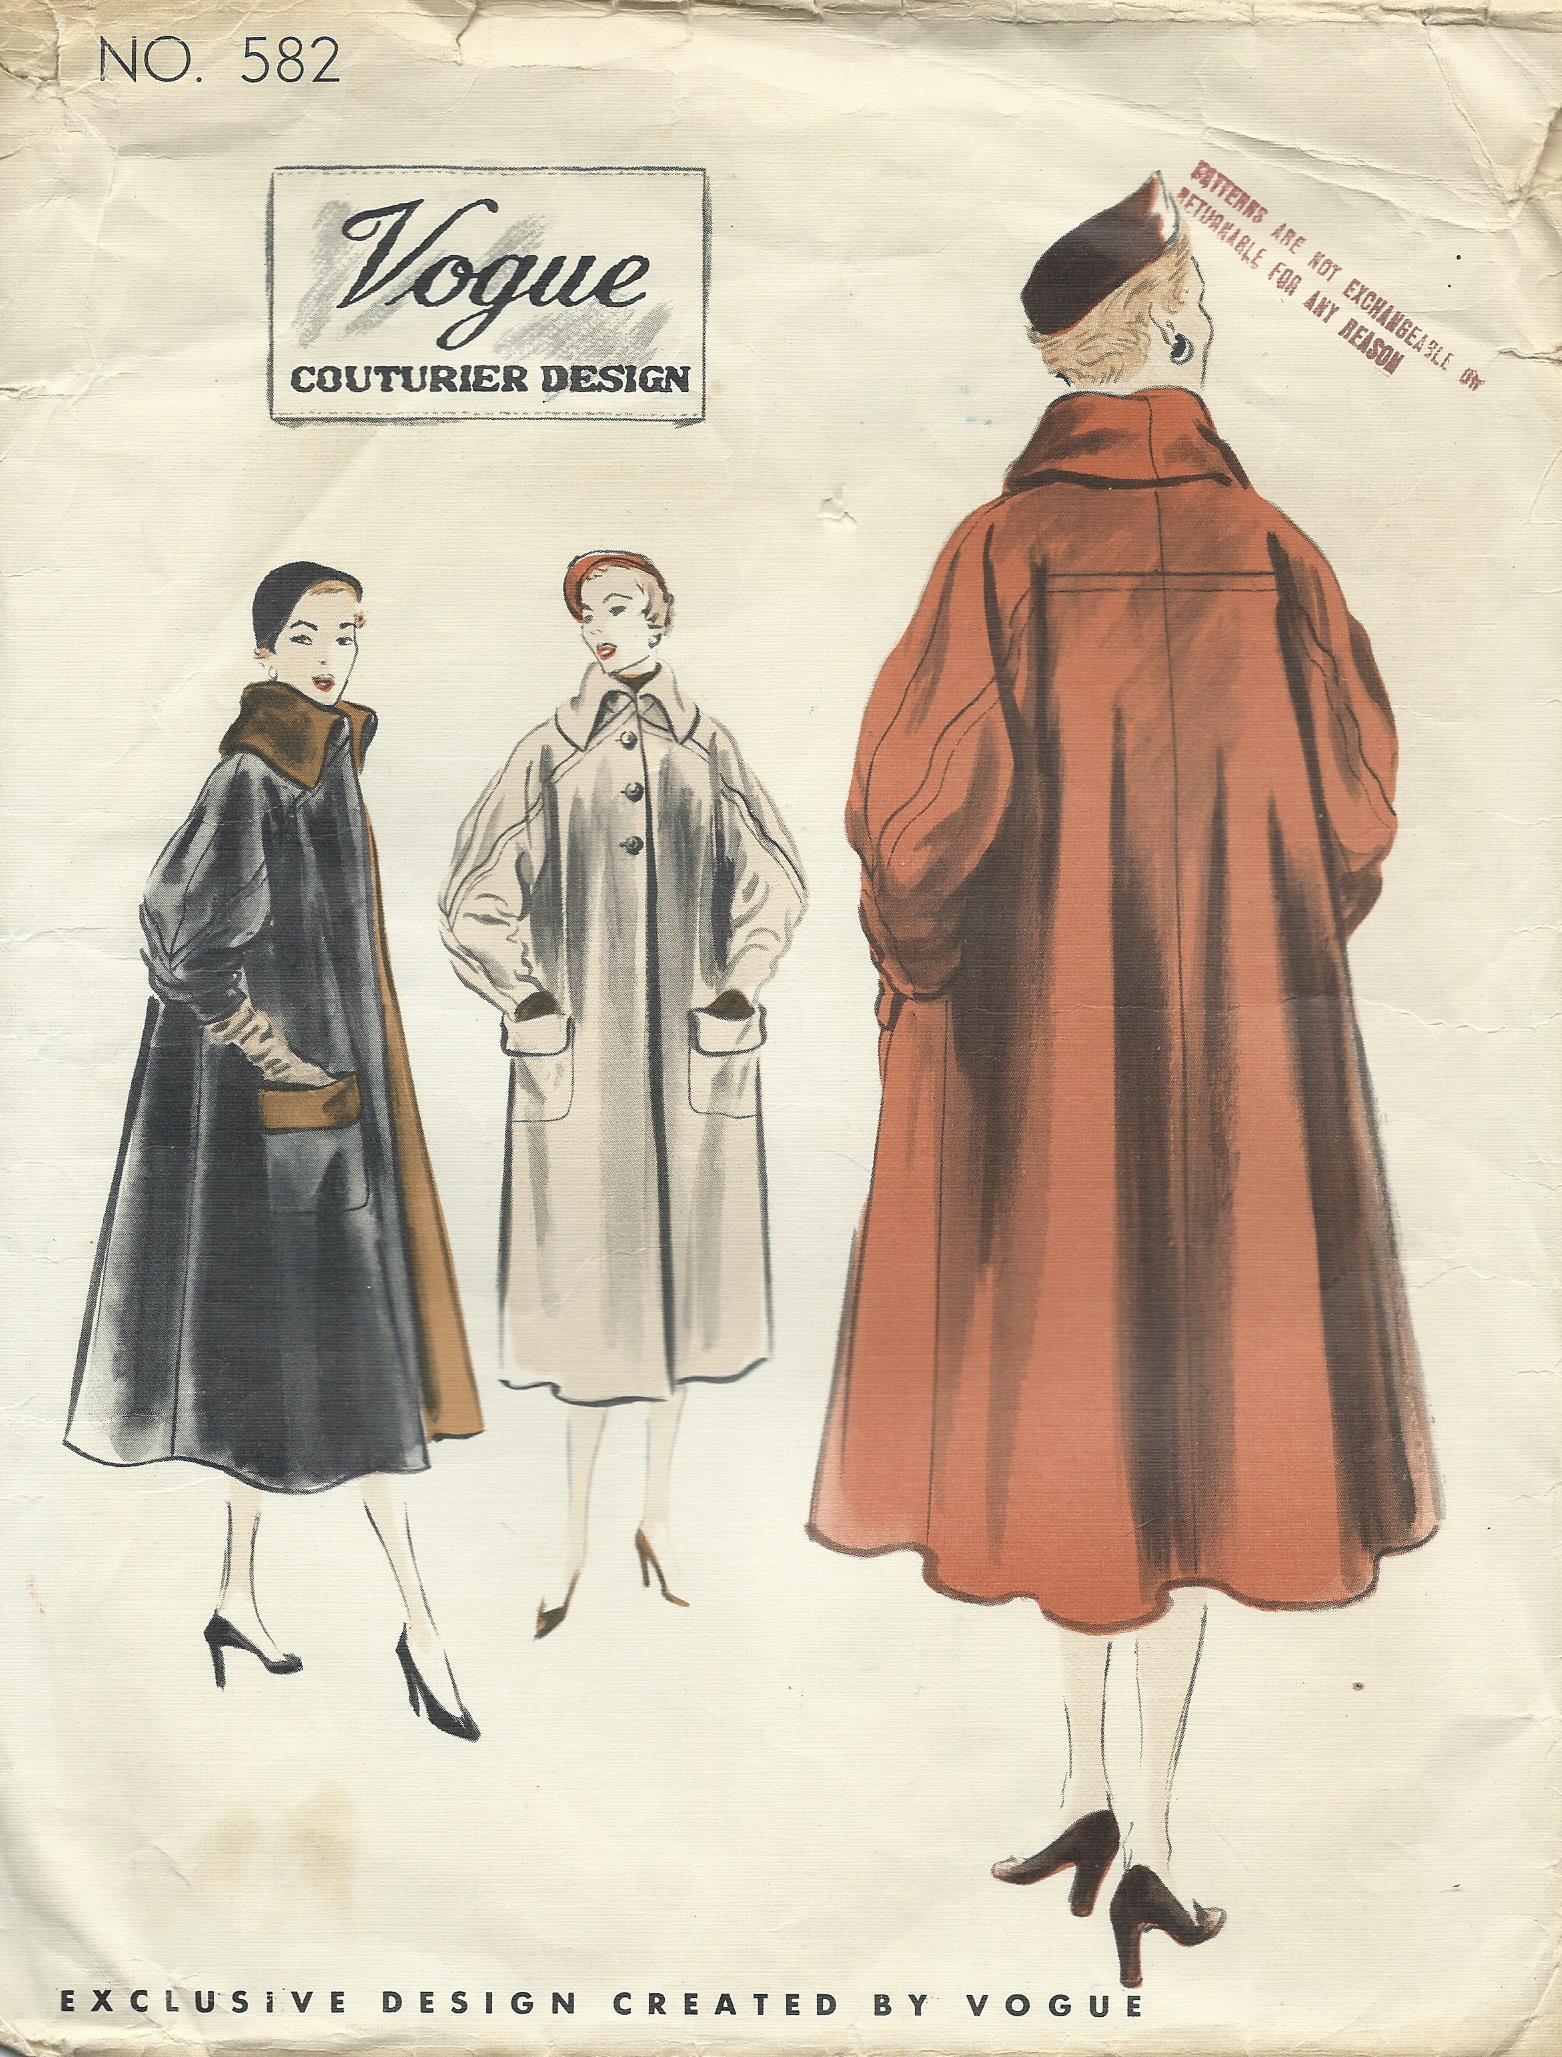 Vogue 582